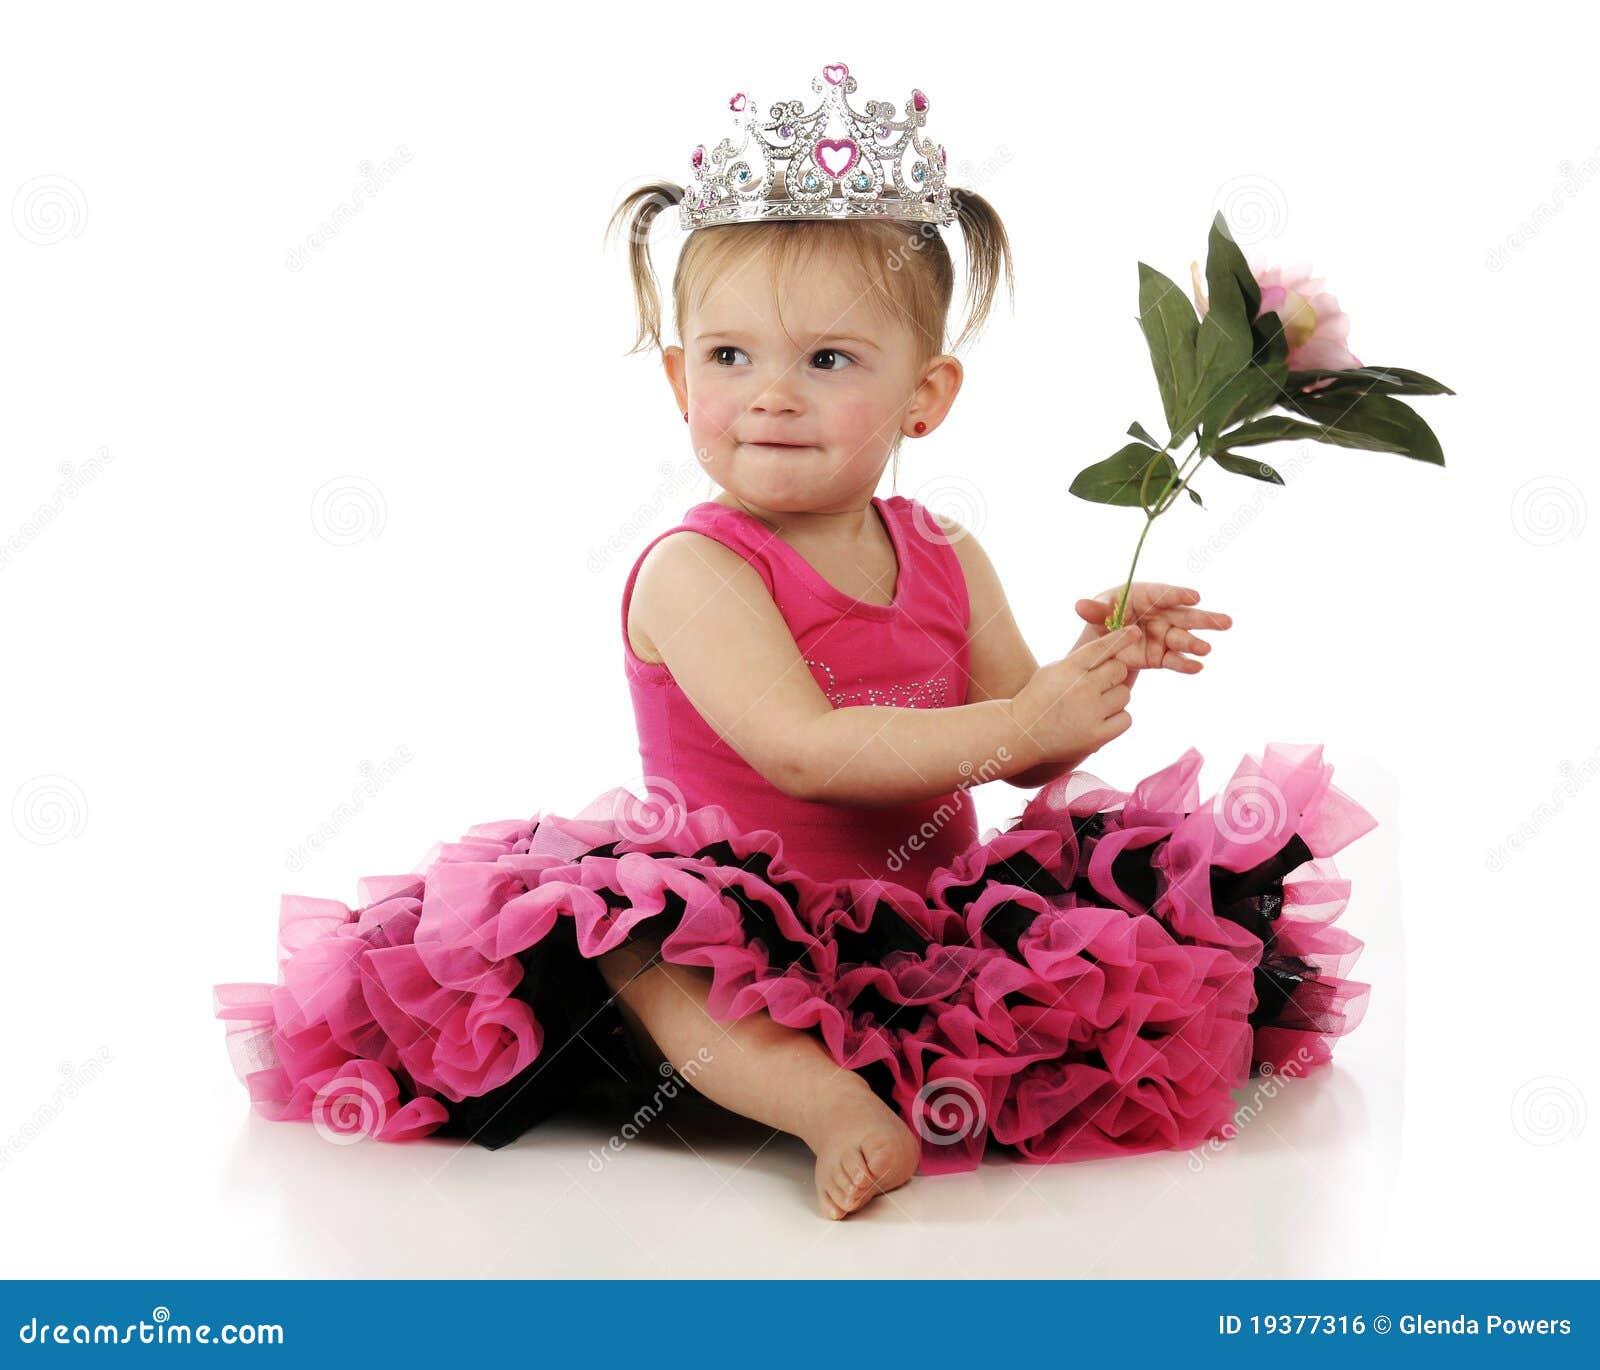 Flower Princess Royalty Free Stock Image Image